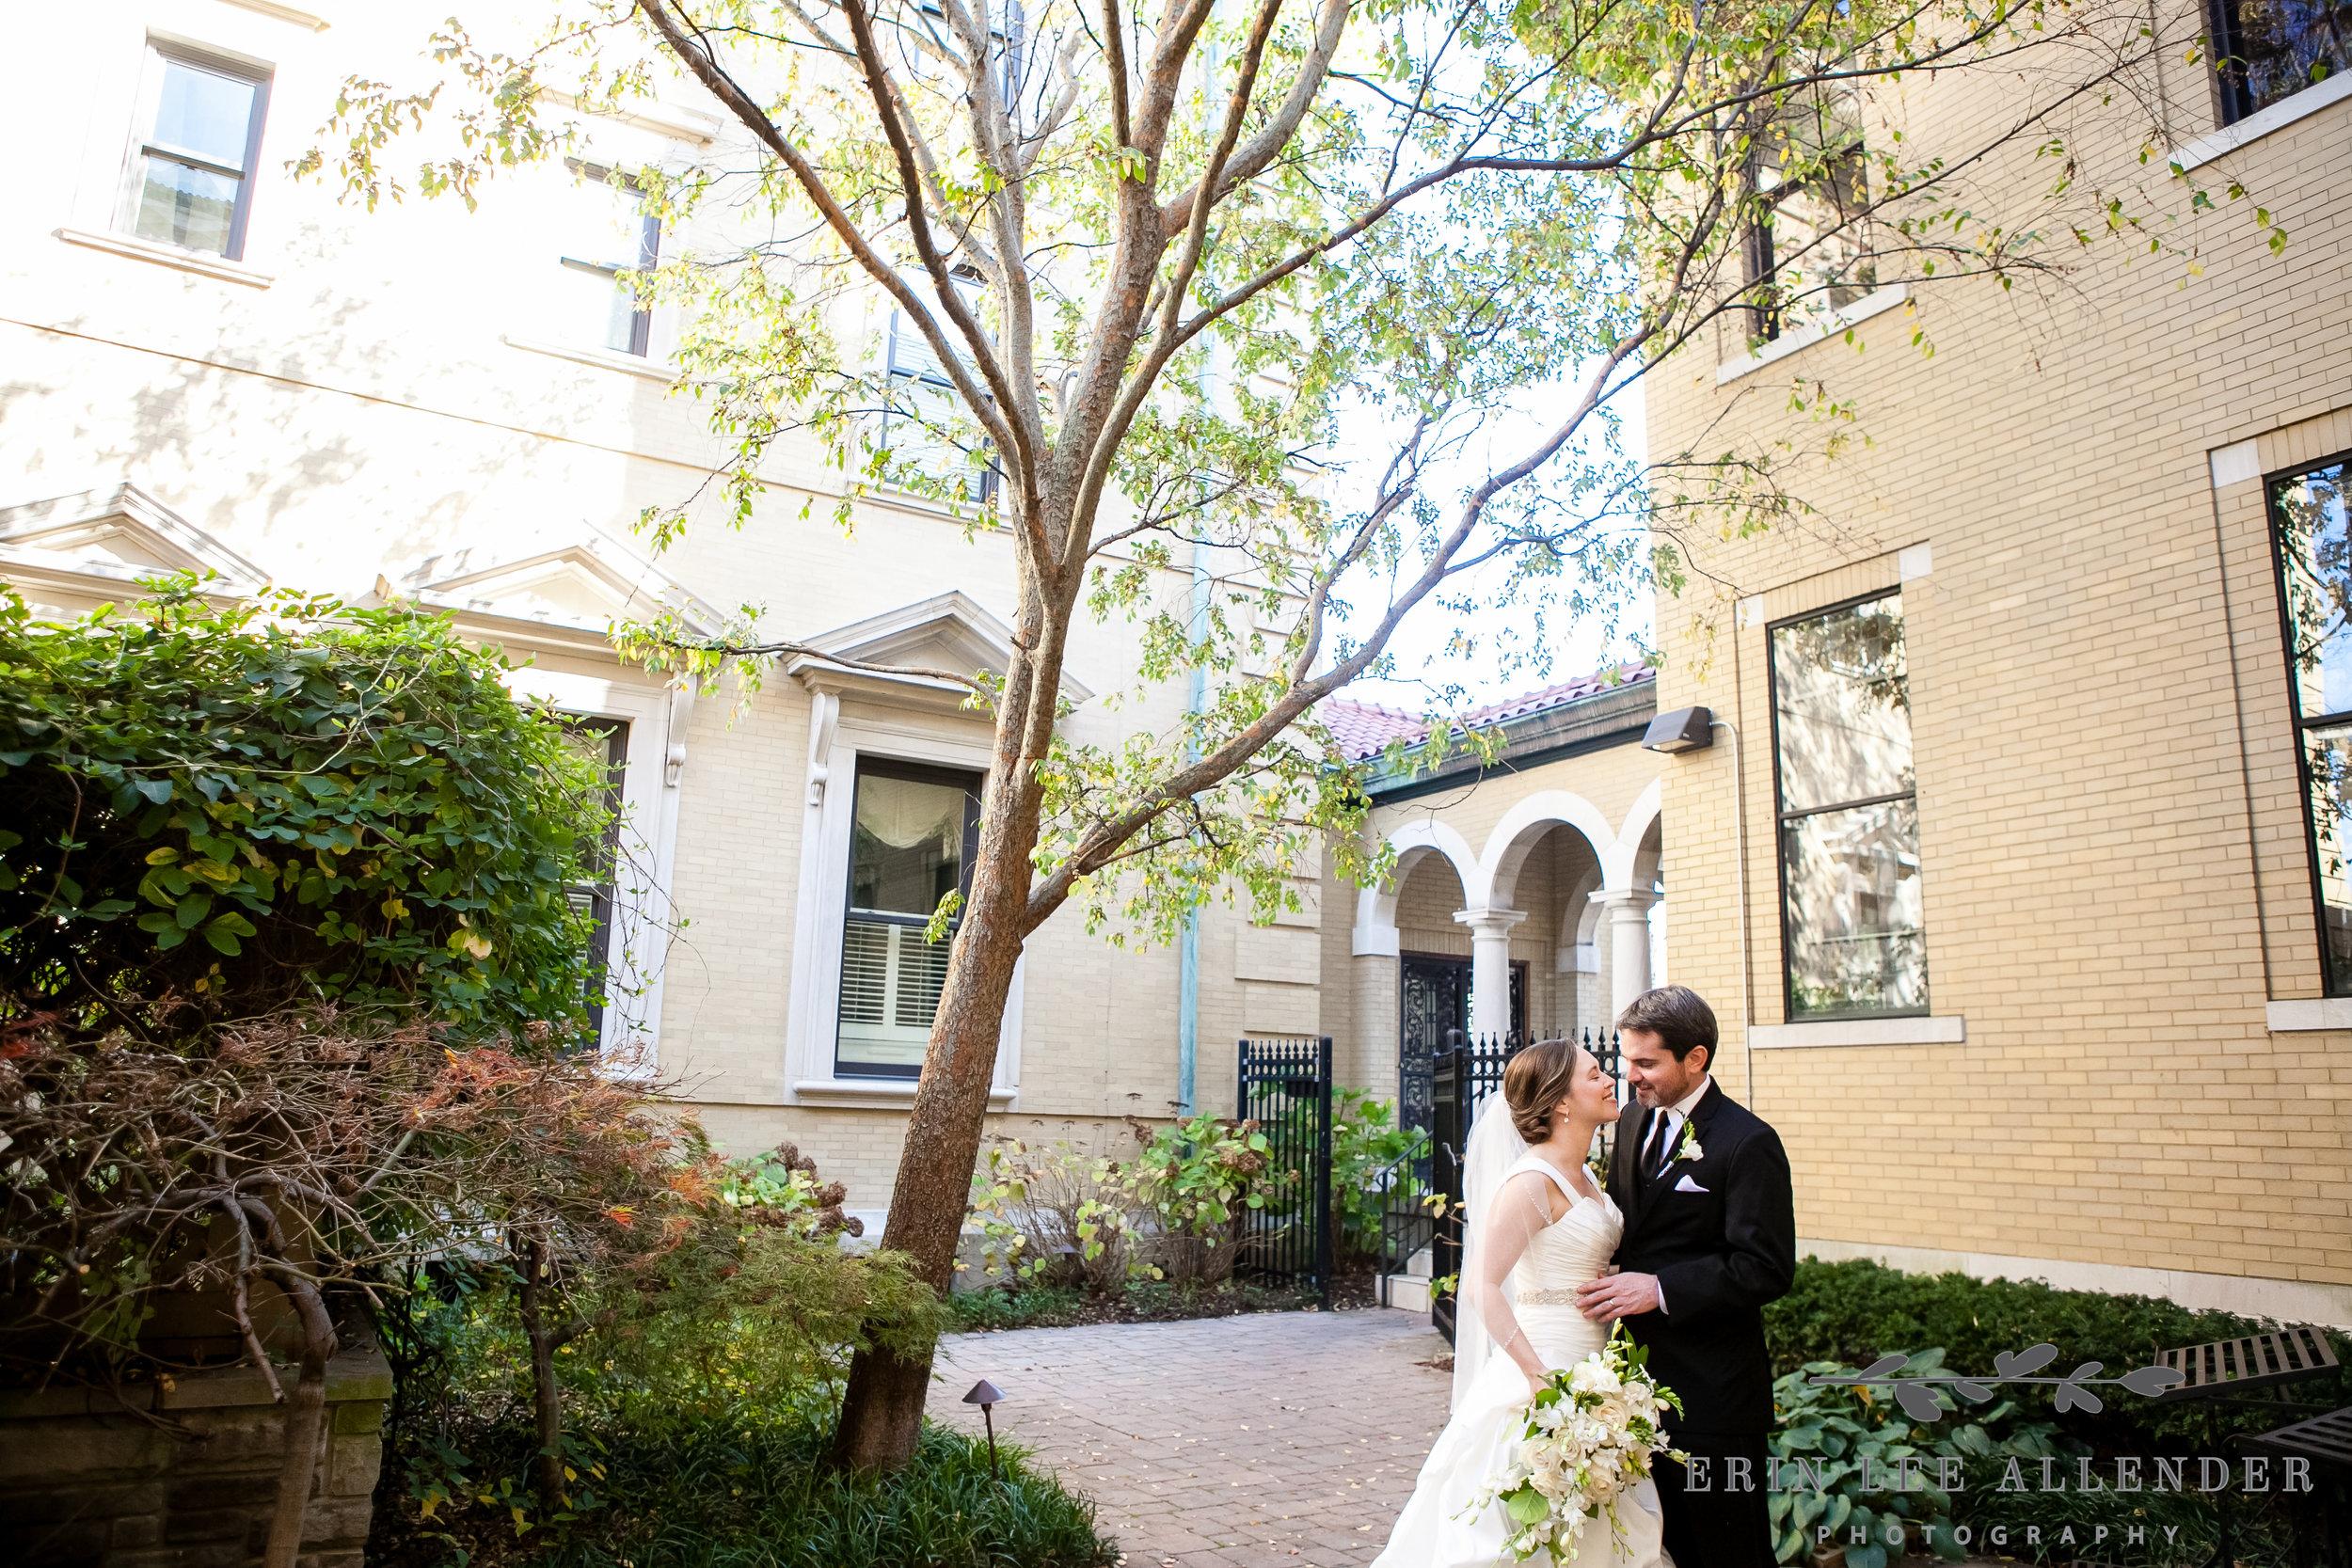 Couple_In_Beautiful_Courtyard